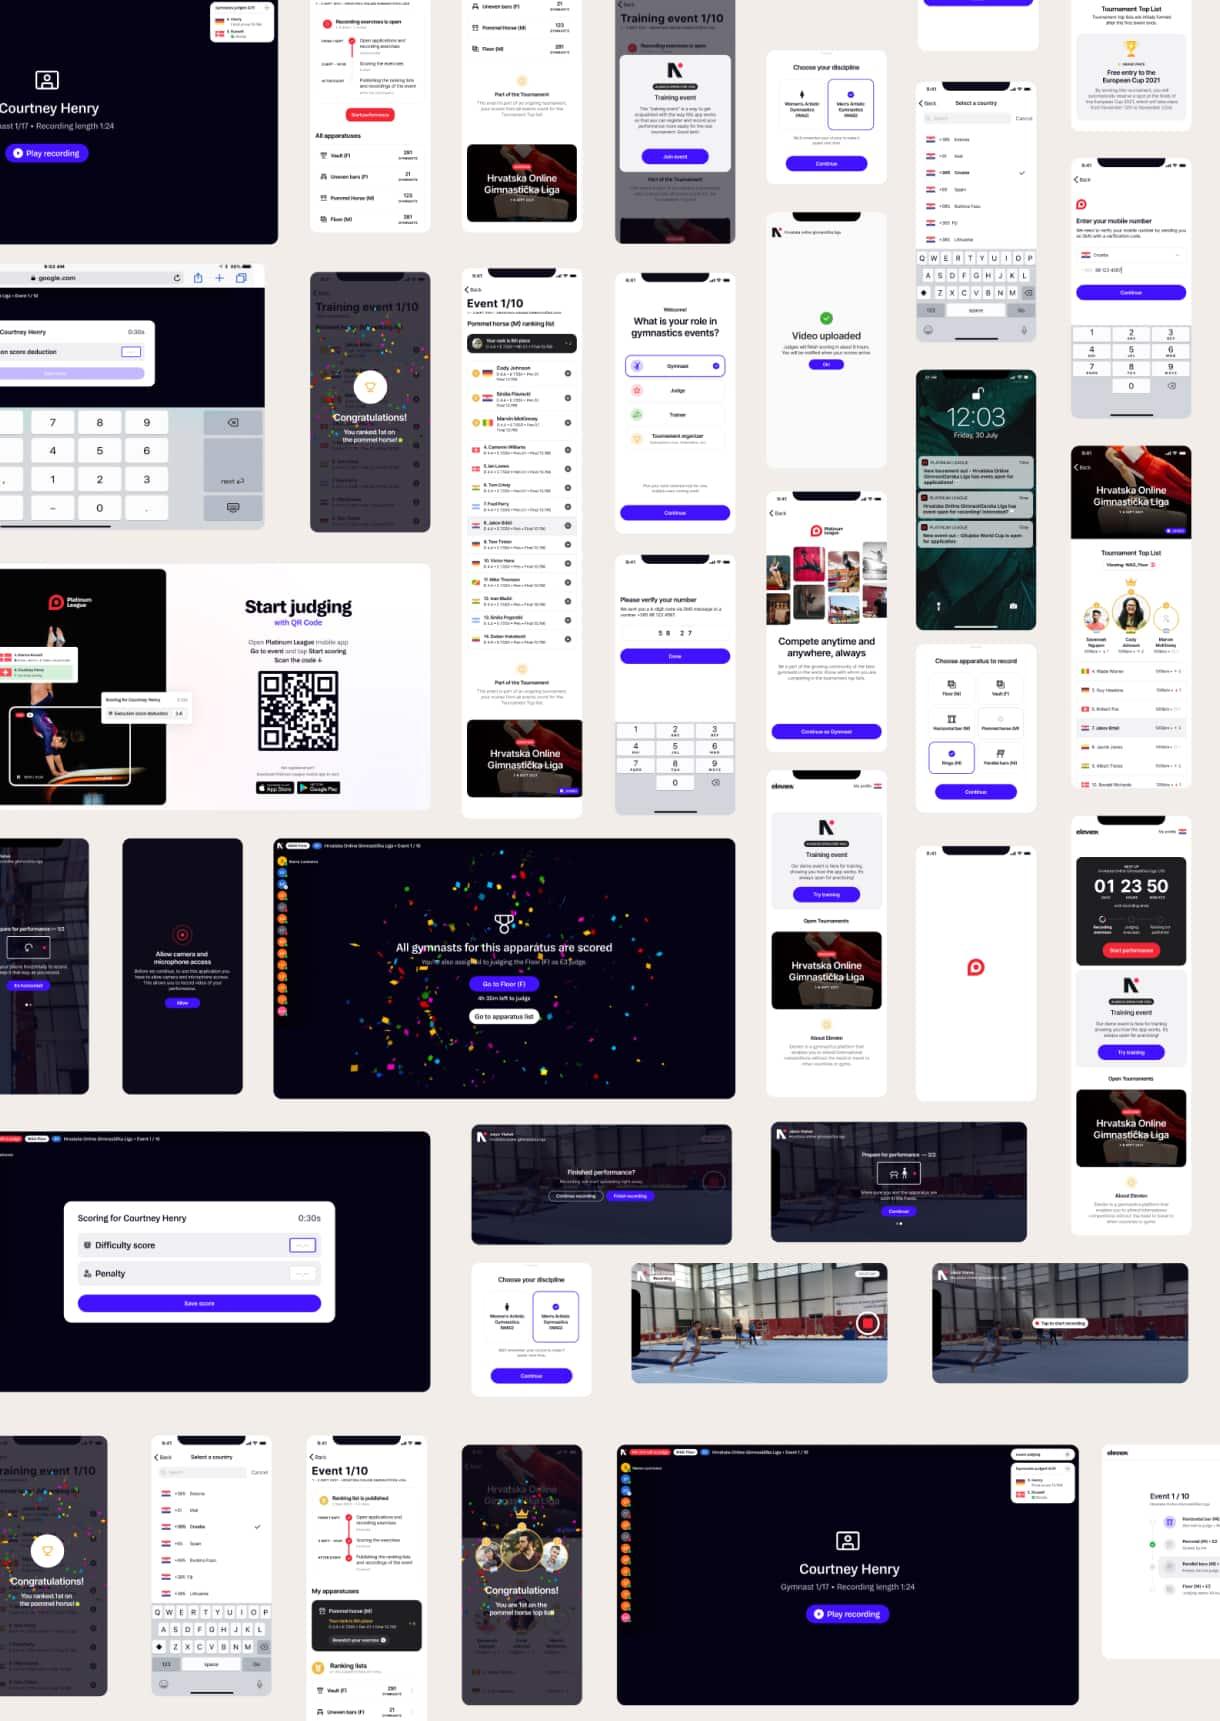 online gymnastics platform project image